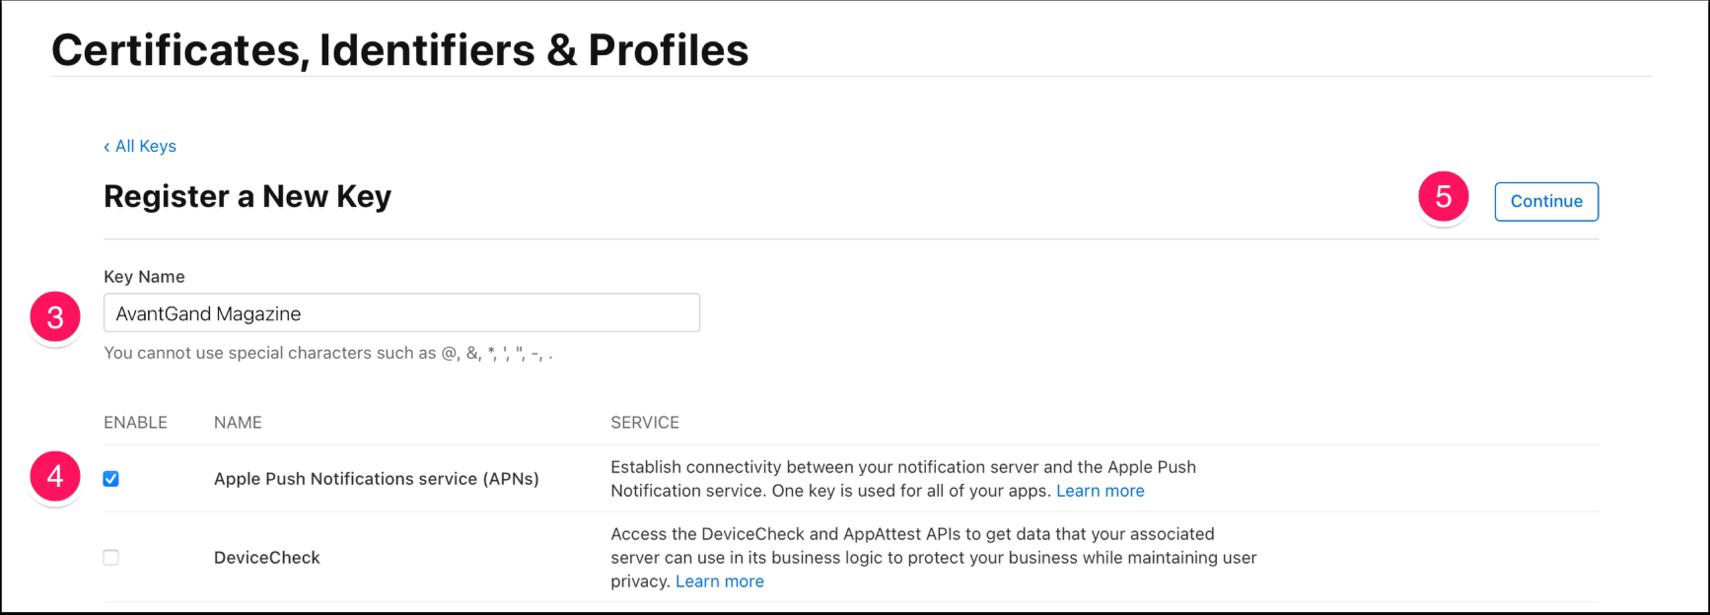 Certificates, Identifiers & Profiles - Apple Developer